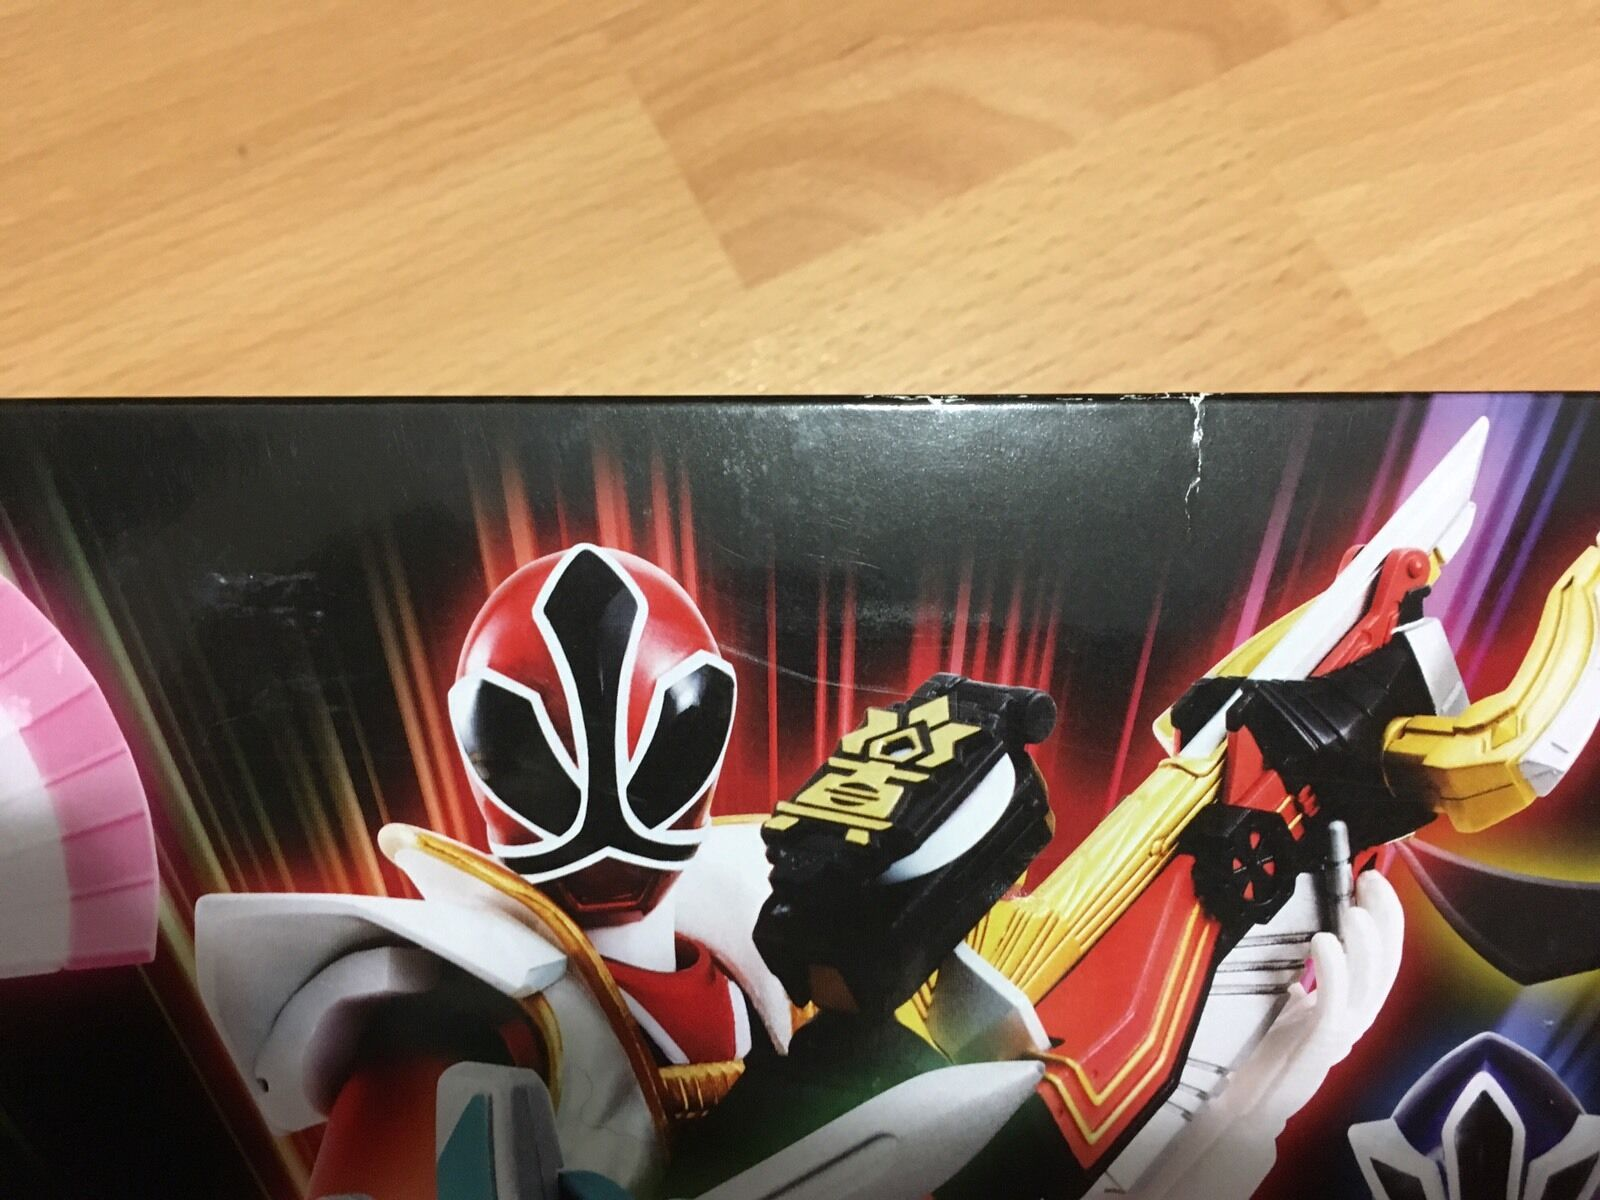 Bandai Tamashii S.H. S.H. S.H. Figuarts Power Rangers Super Samurai Metallic Set SDCC 2013 2858c9